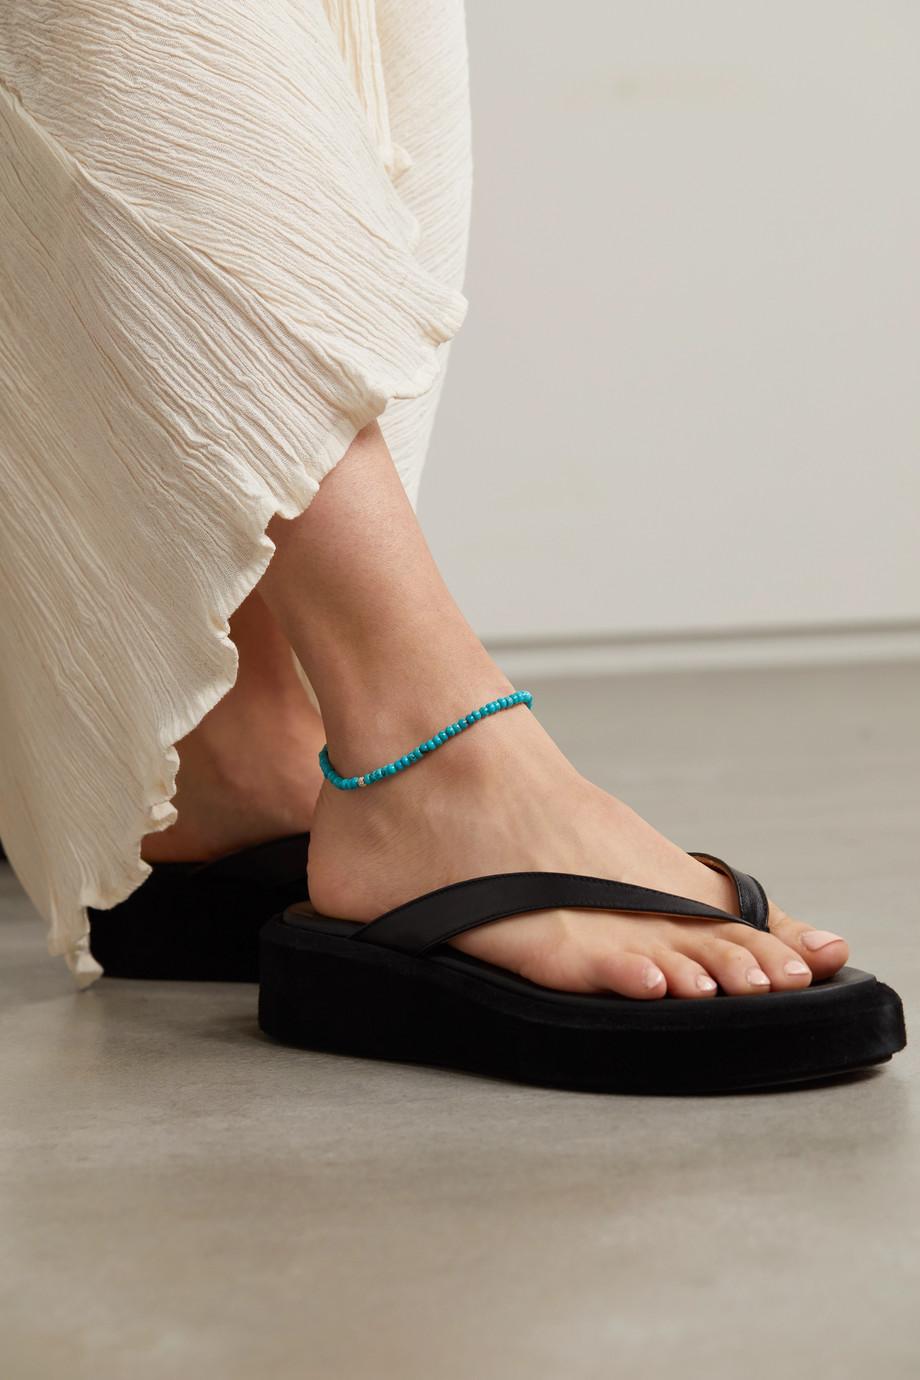 Sydney Evan 14-karat gold, turquoise and diamond anklet